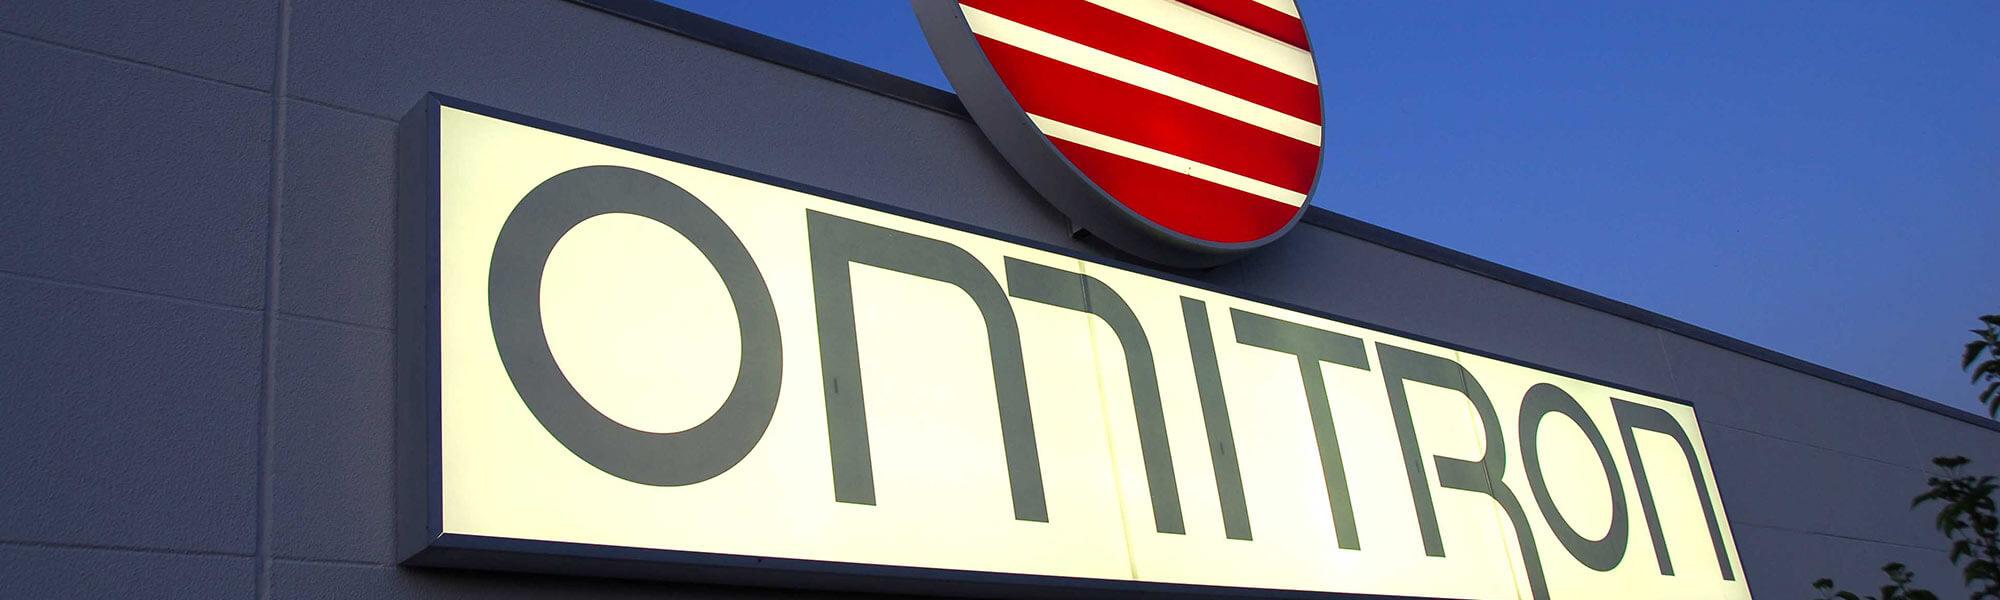 Omitron | elektronische Anlagen & Software